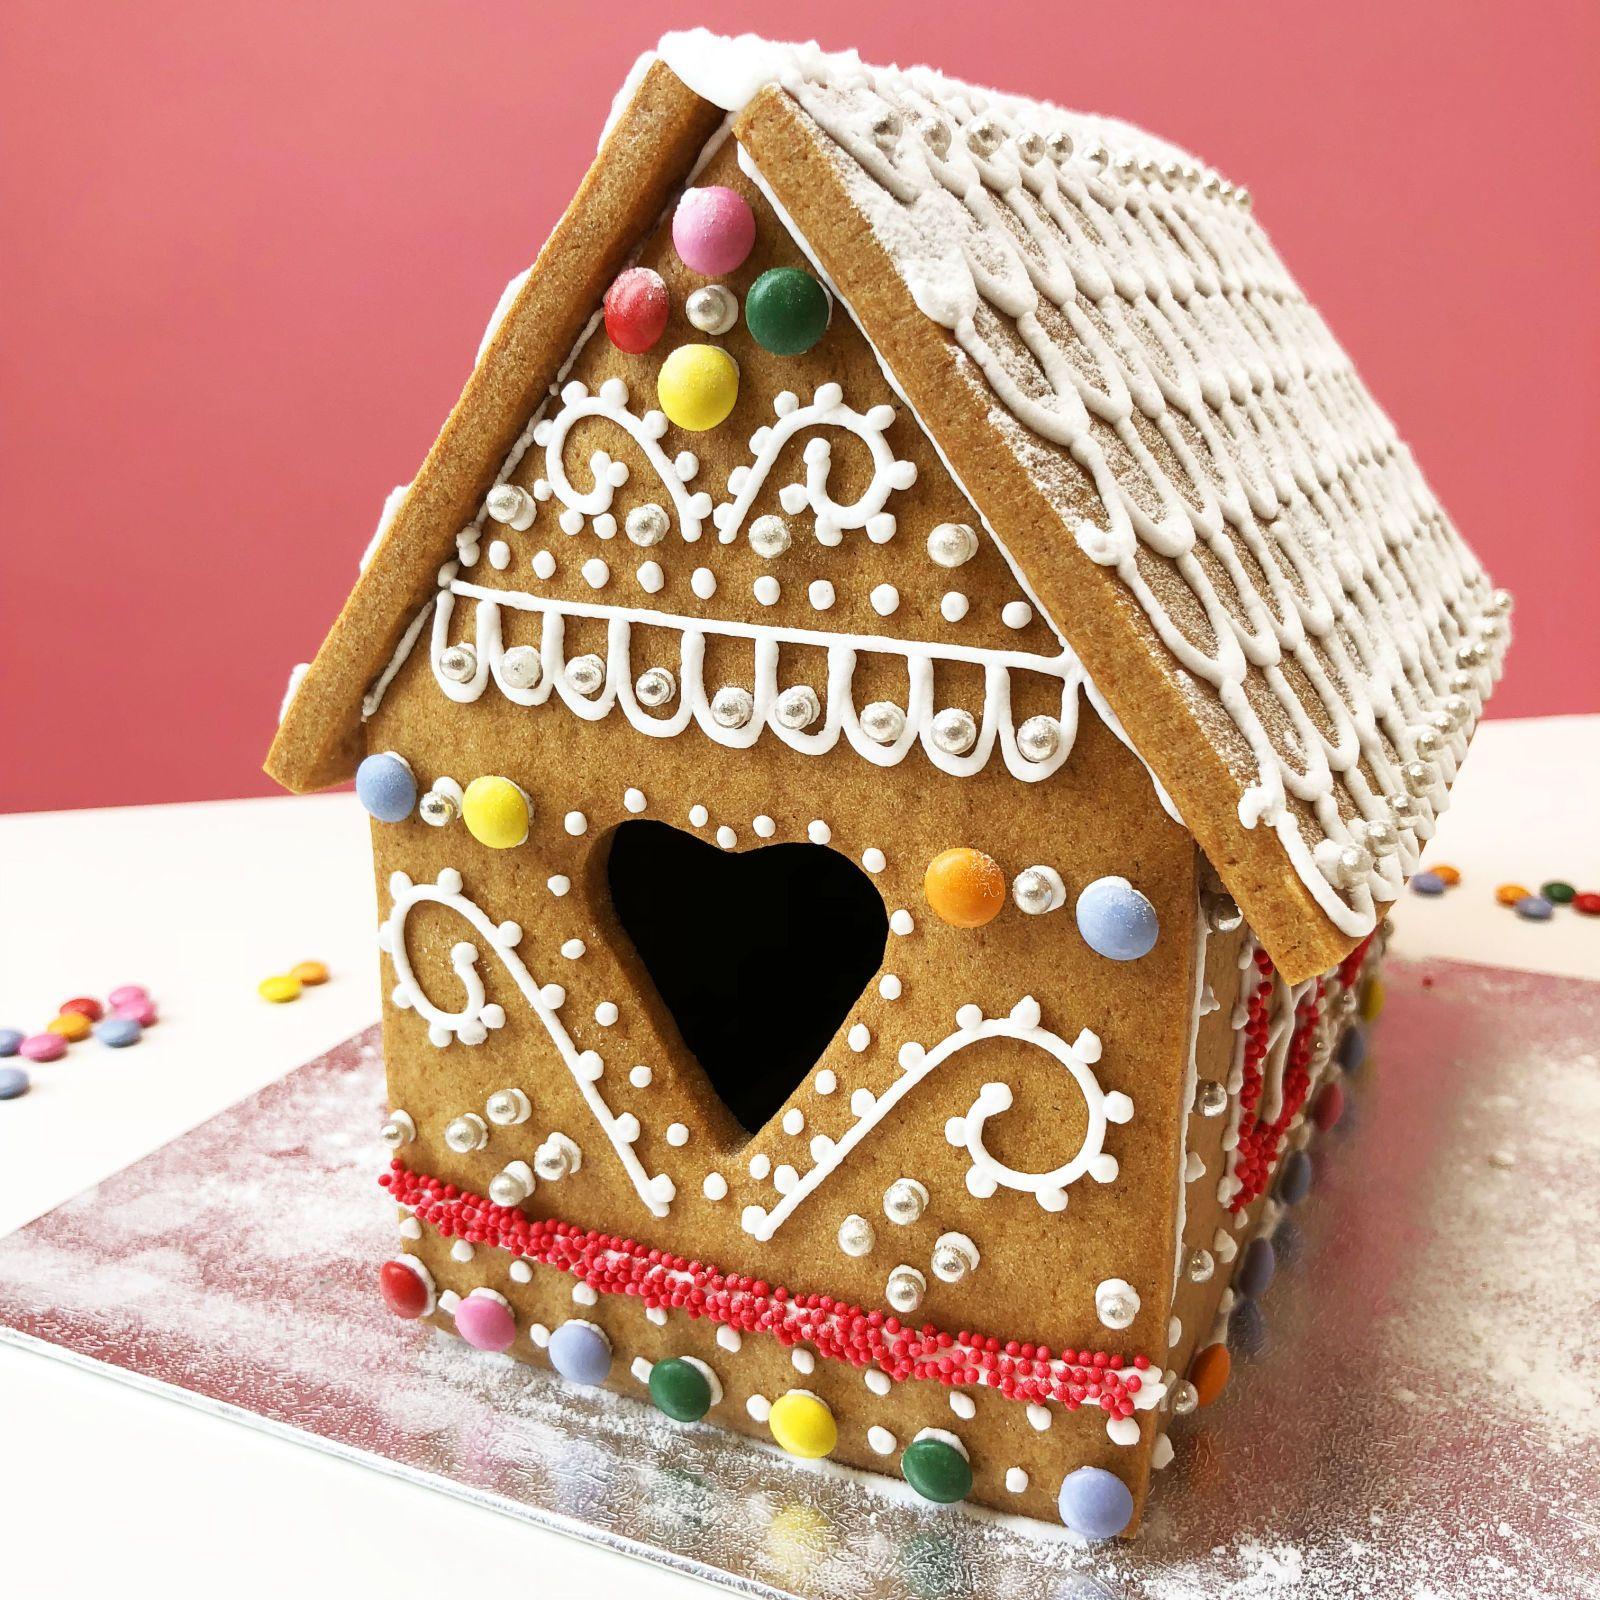 Christmas Gingerbread House Kit.This Diy Gingerbread House Kit Helps You Make An Edible